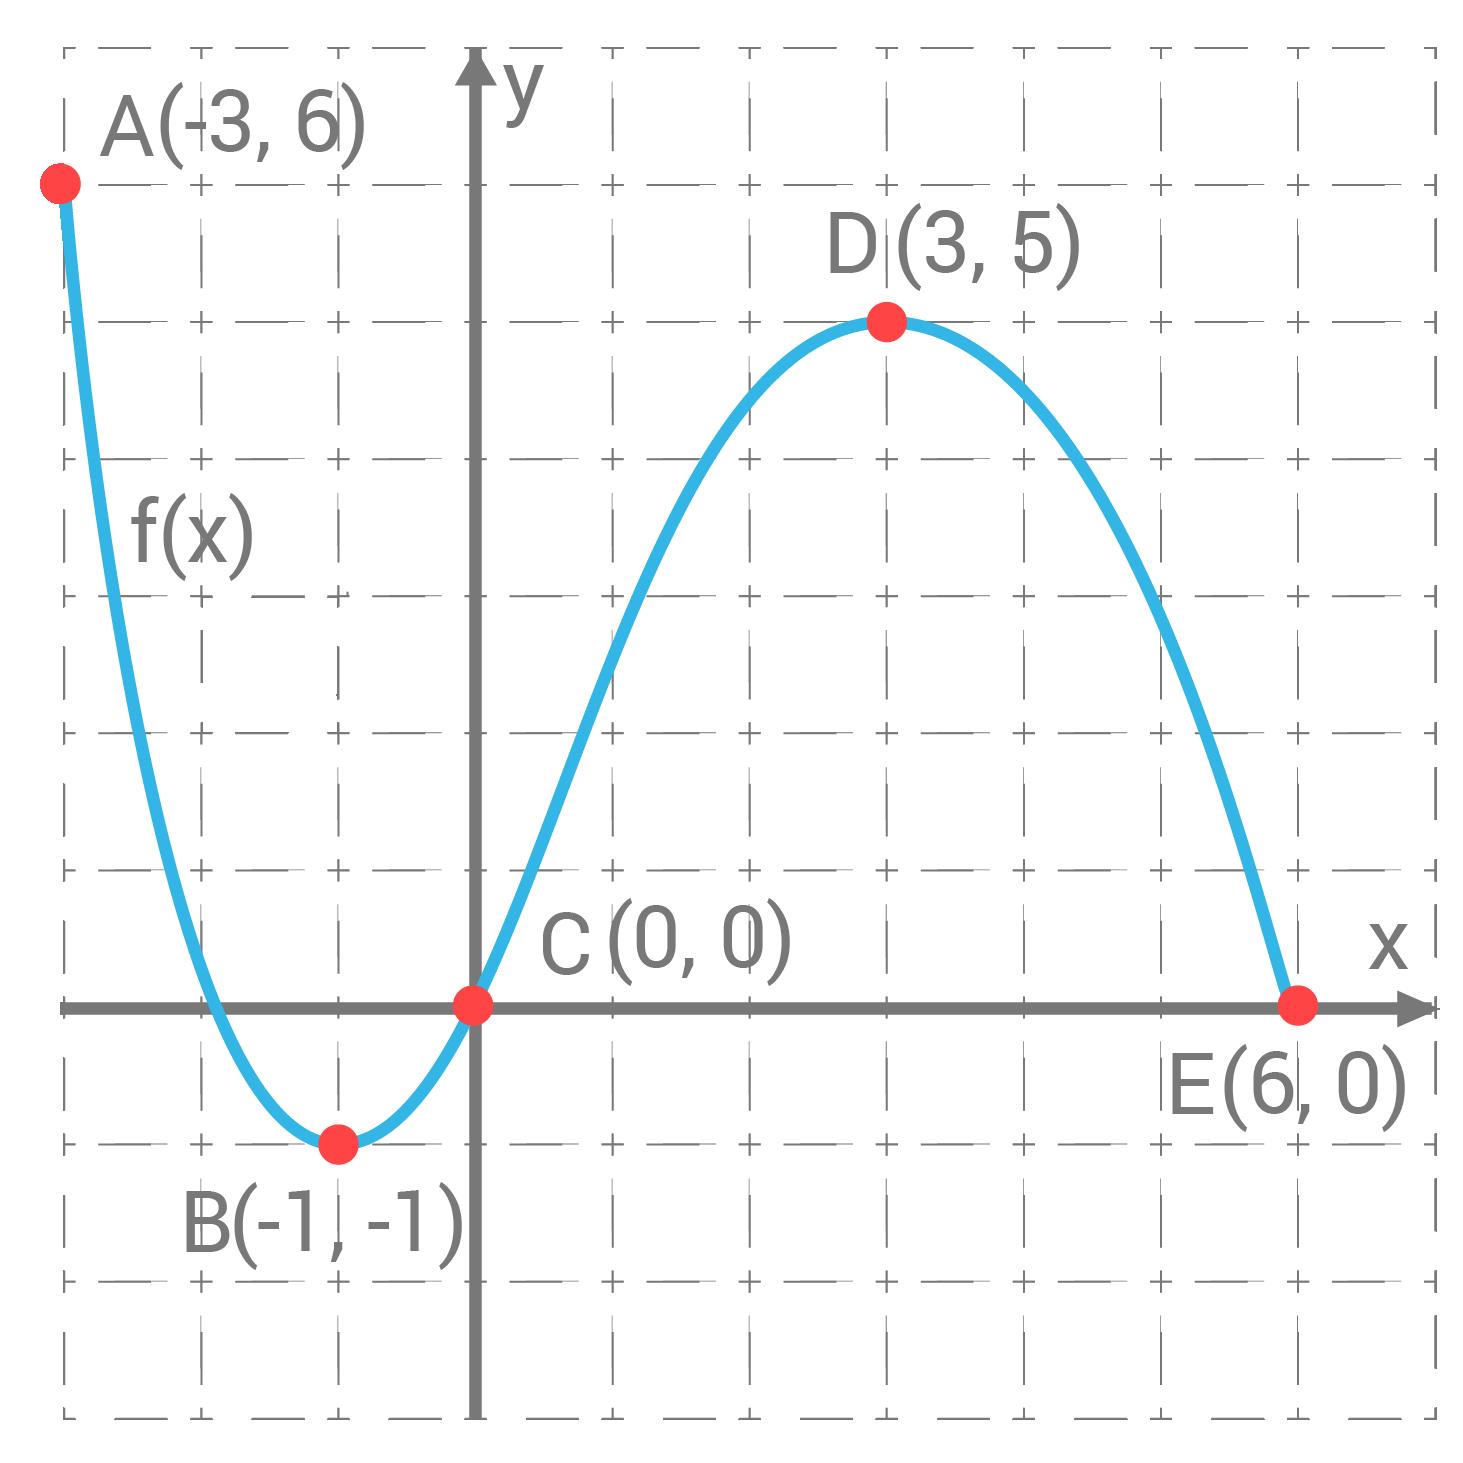 koordinatsystem_polynomfunktion_2-01